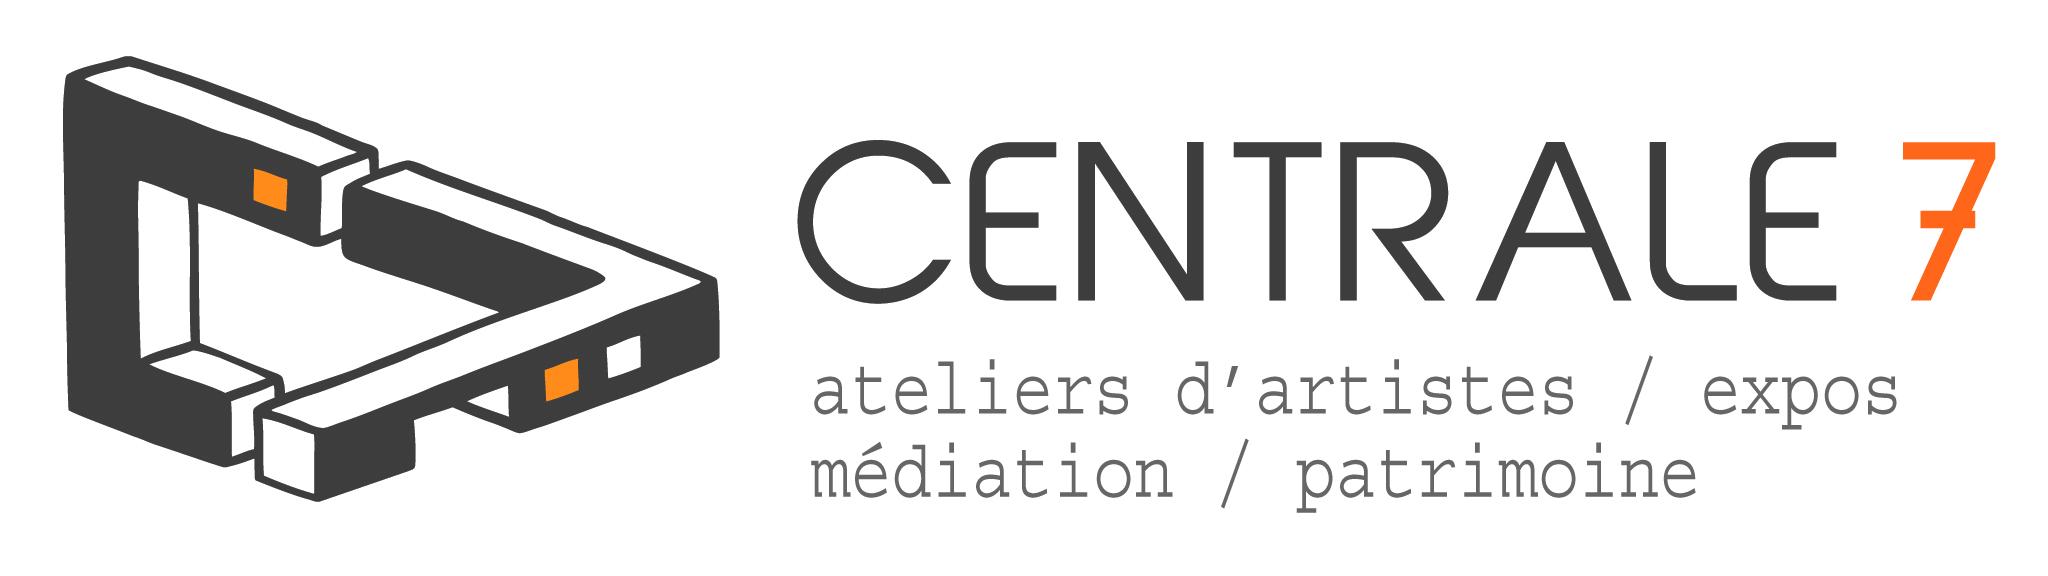 CMJN_Centrale 7_long